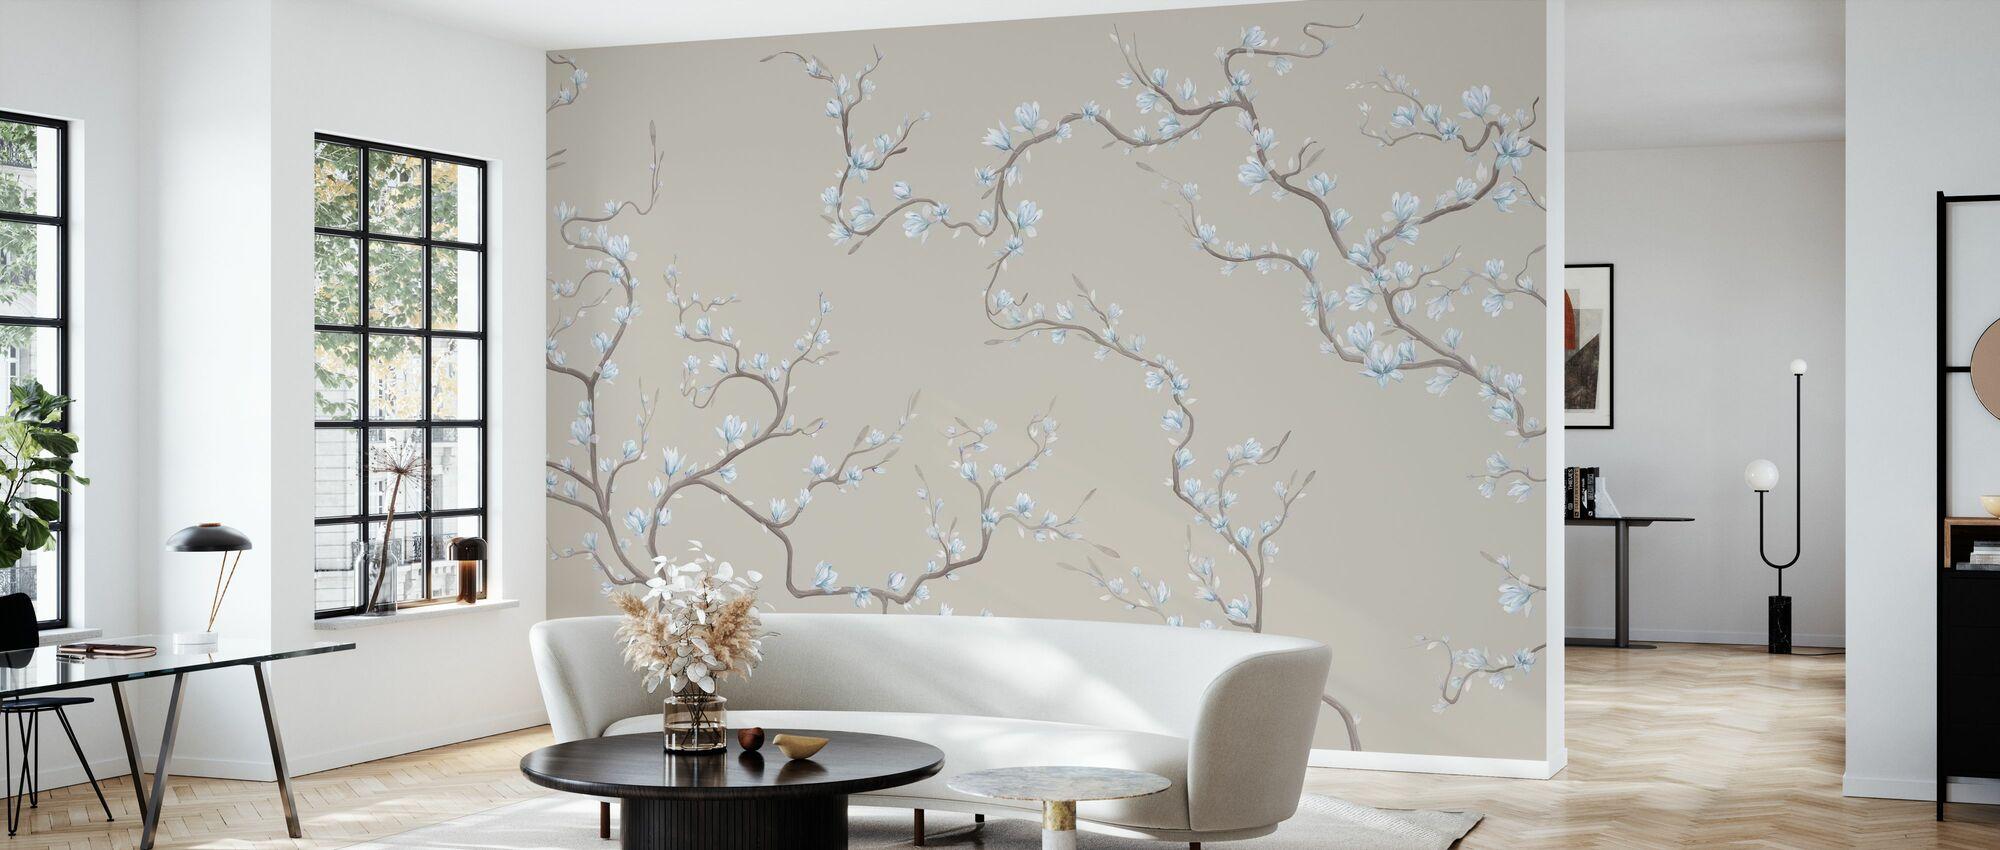 Flourishing Magnolia - Soft Natur Blue - Wallpaper - Living Room